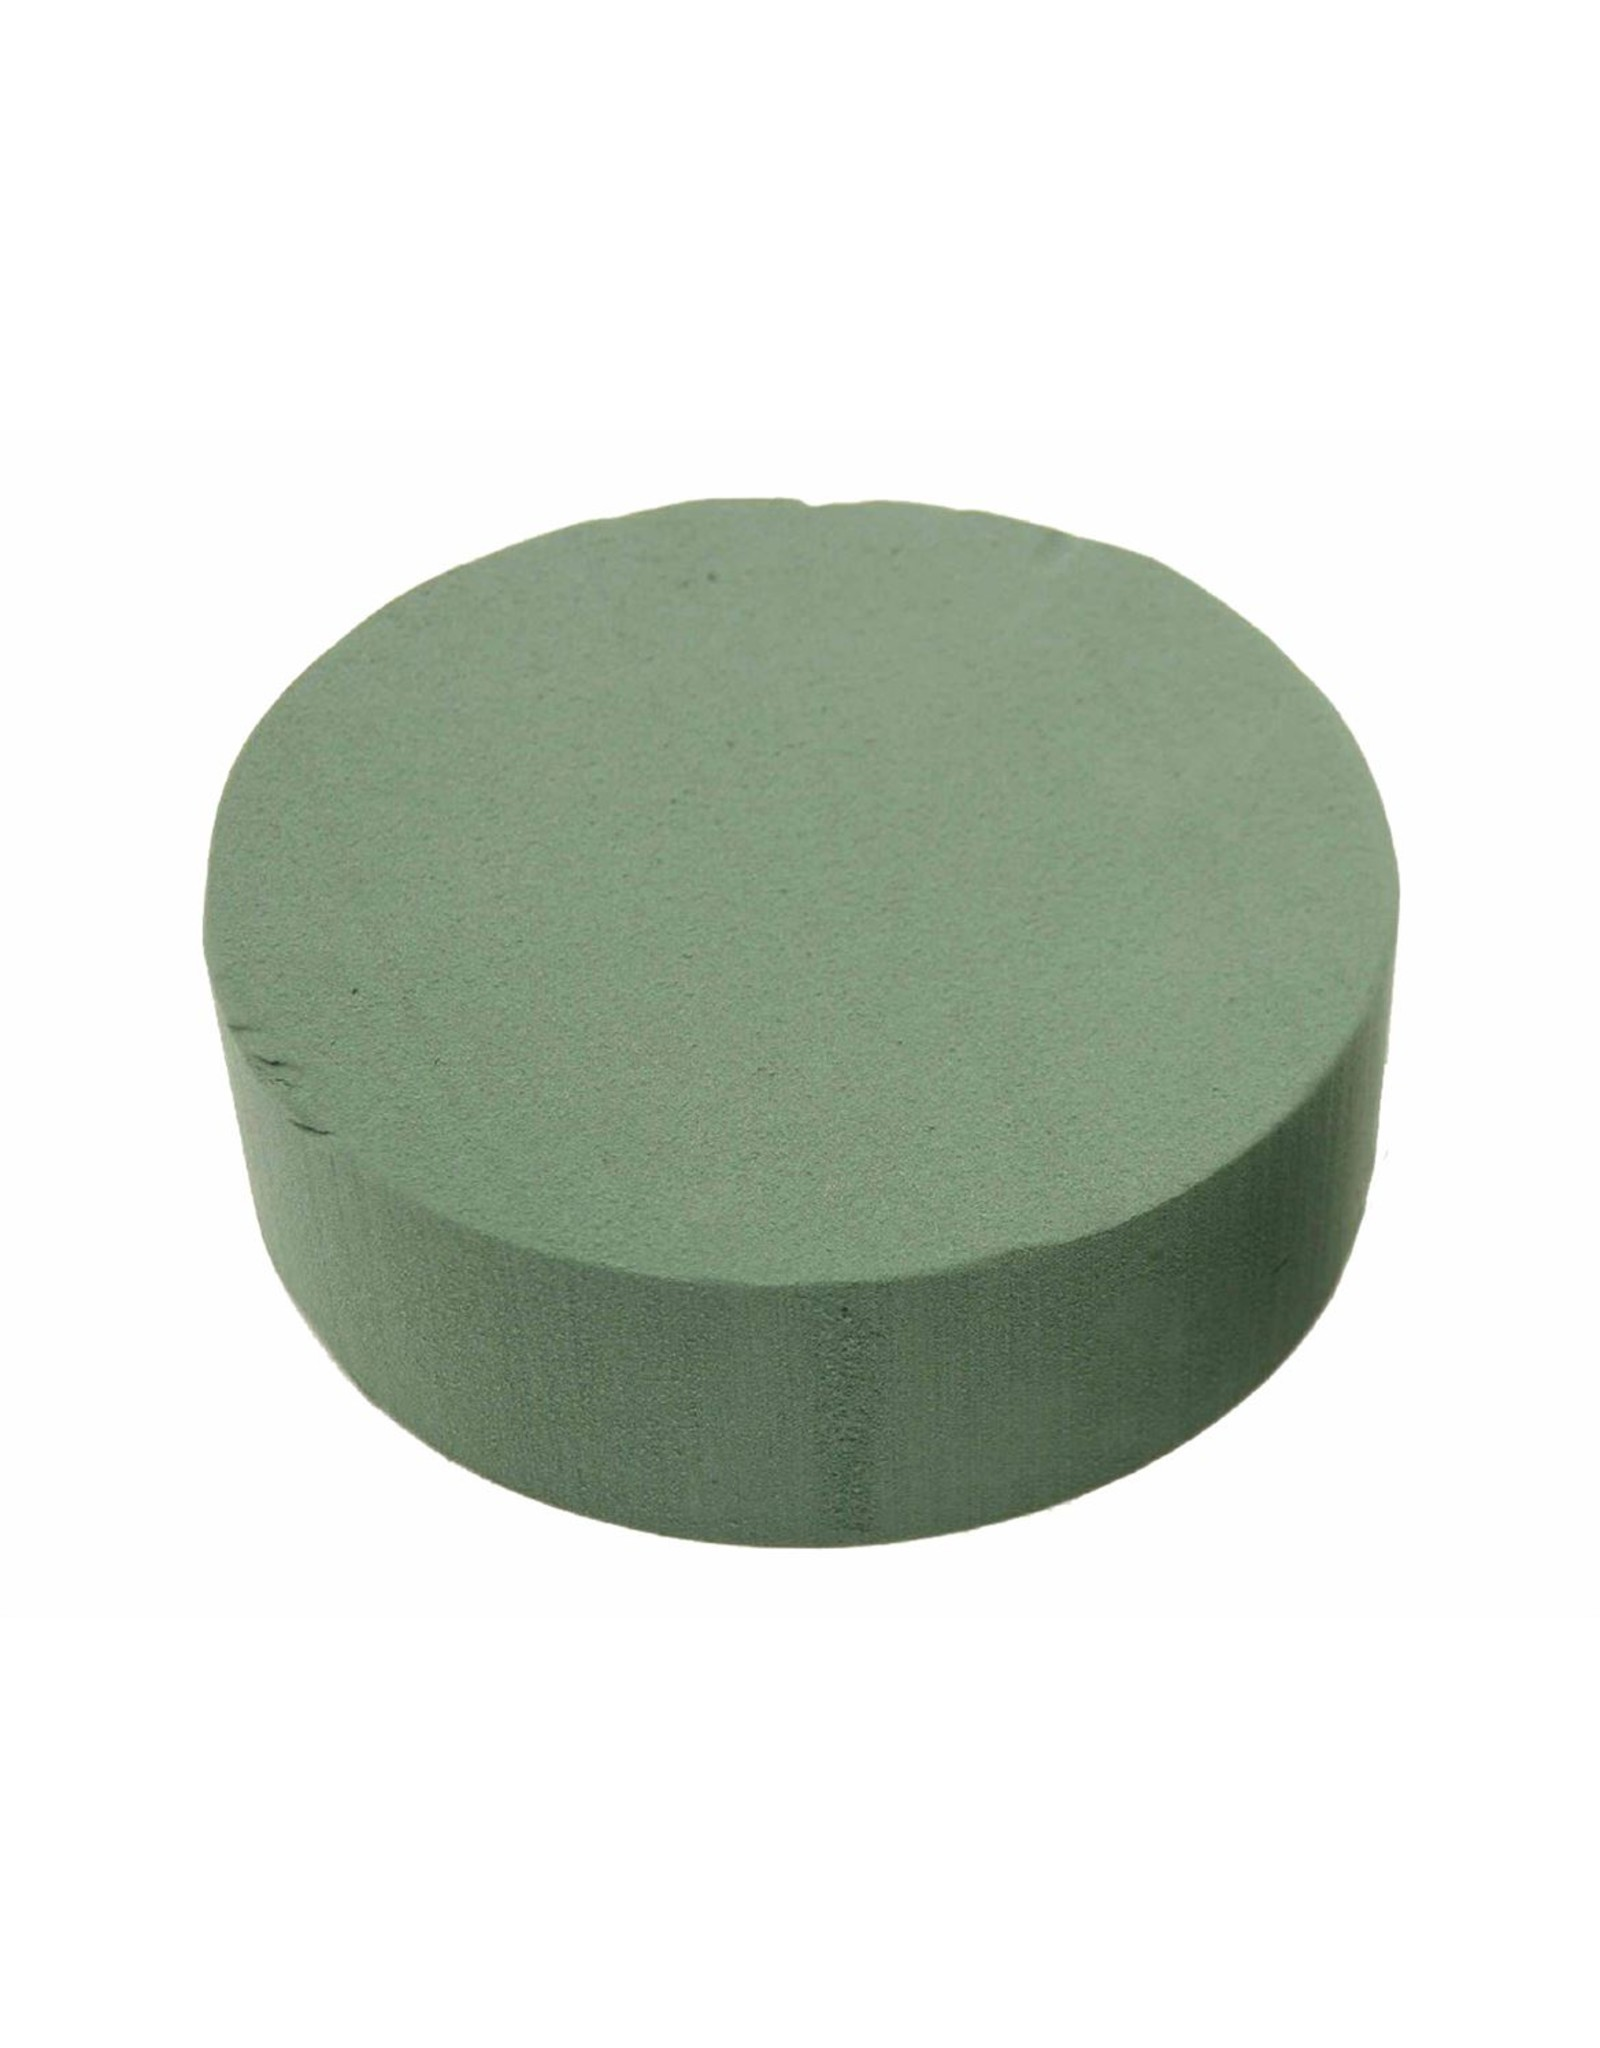 HD Basic Cake Sld Foam D22.0h7.0 x 14